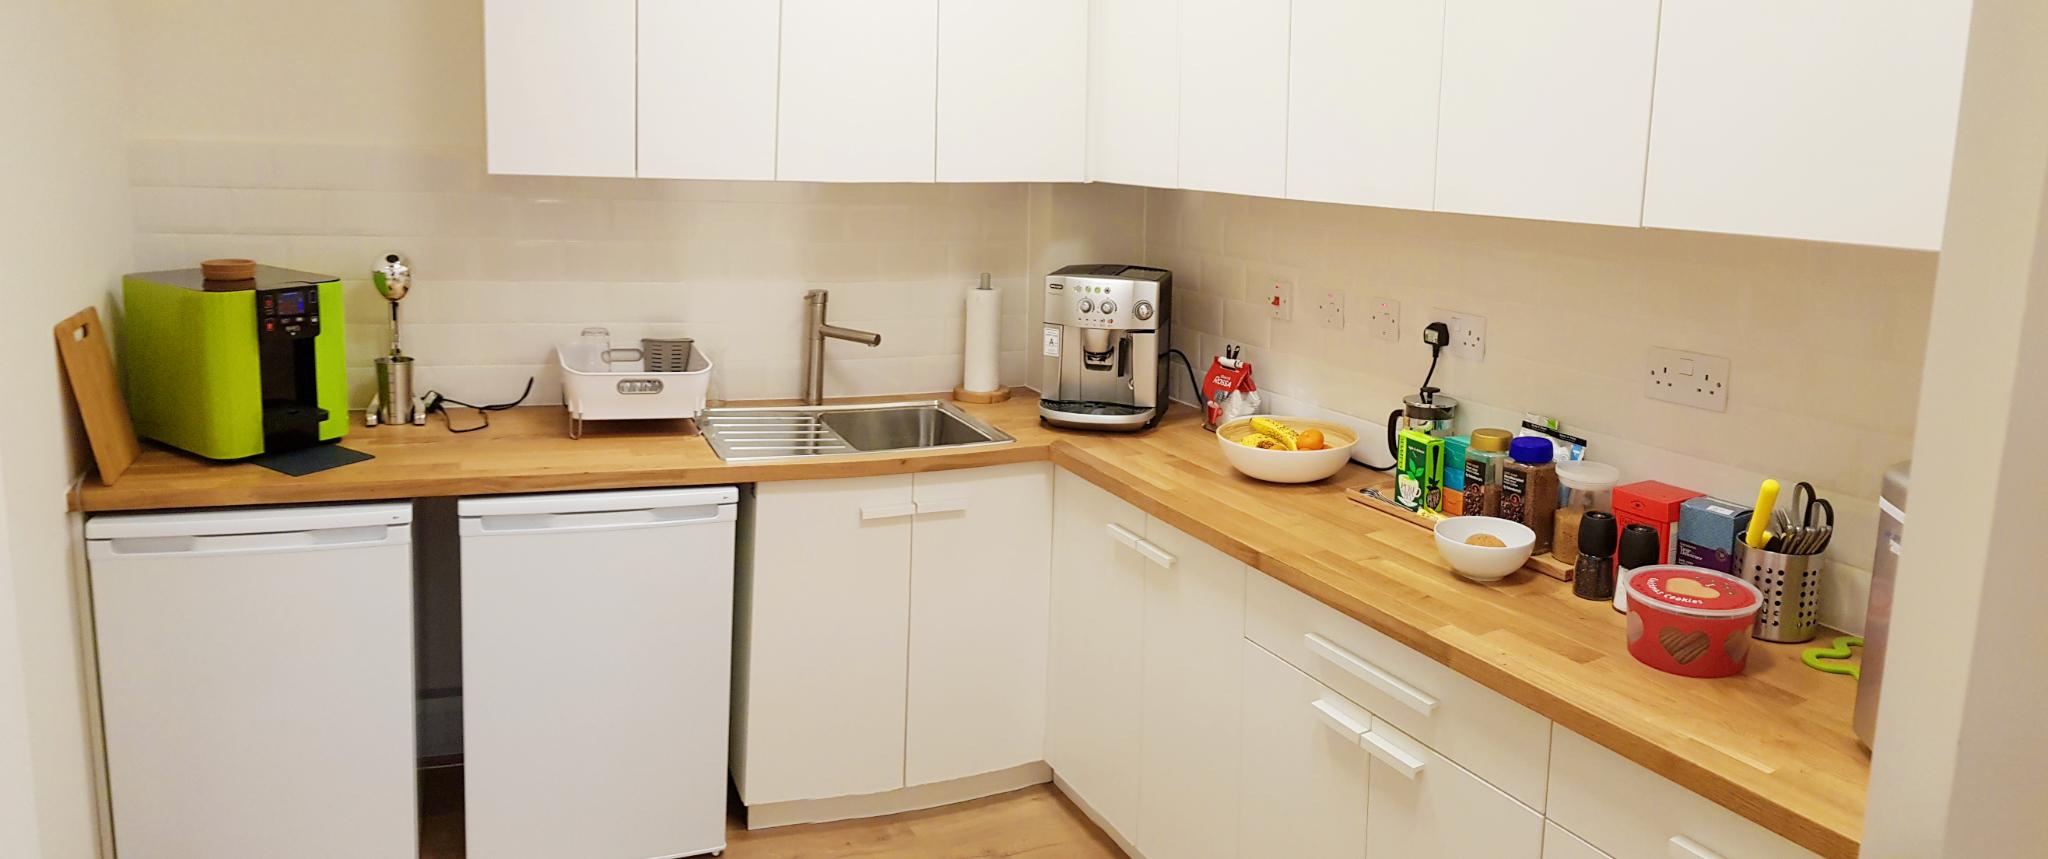 Rentadesk+Shepherds+Bush+co-working+space+-+Kitchen.jpg